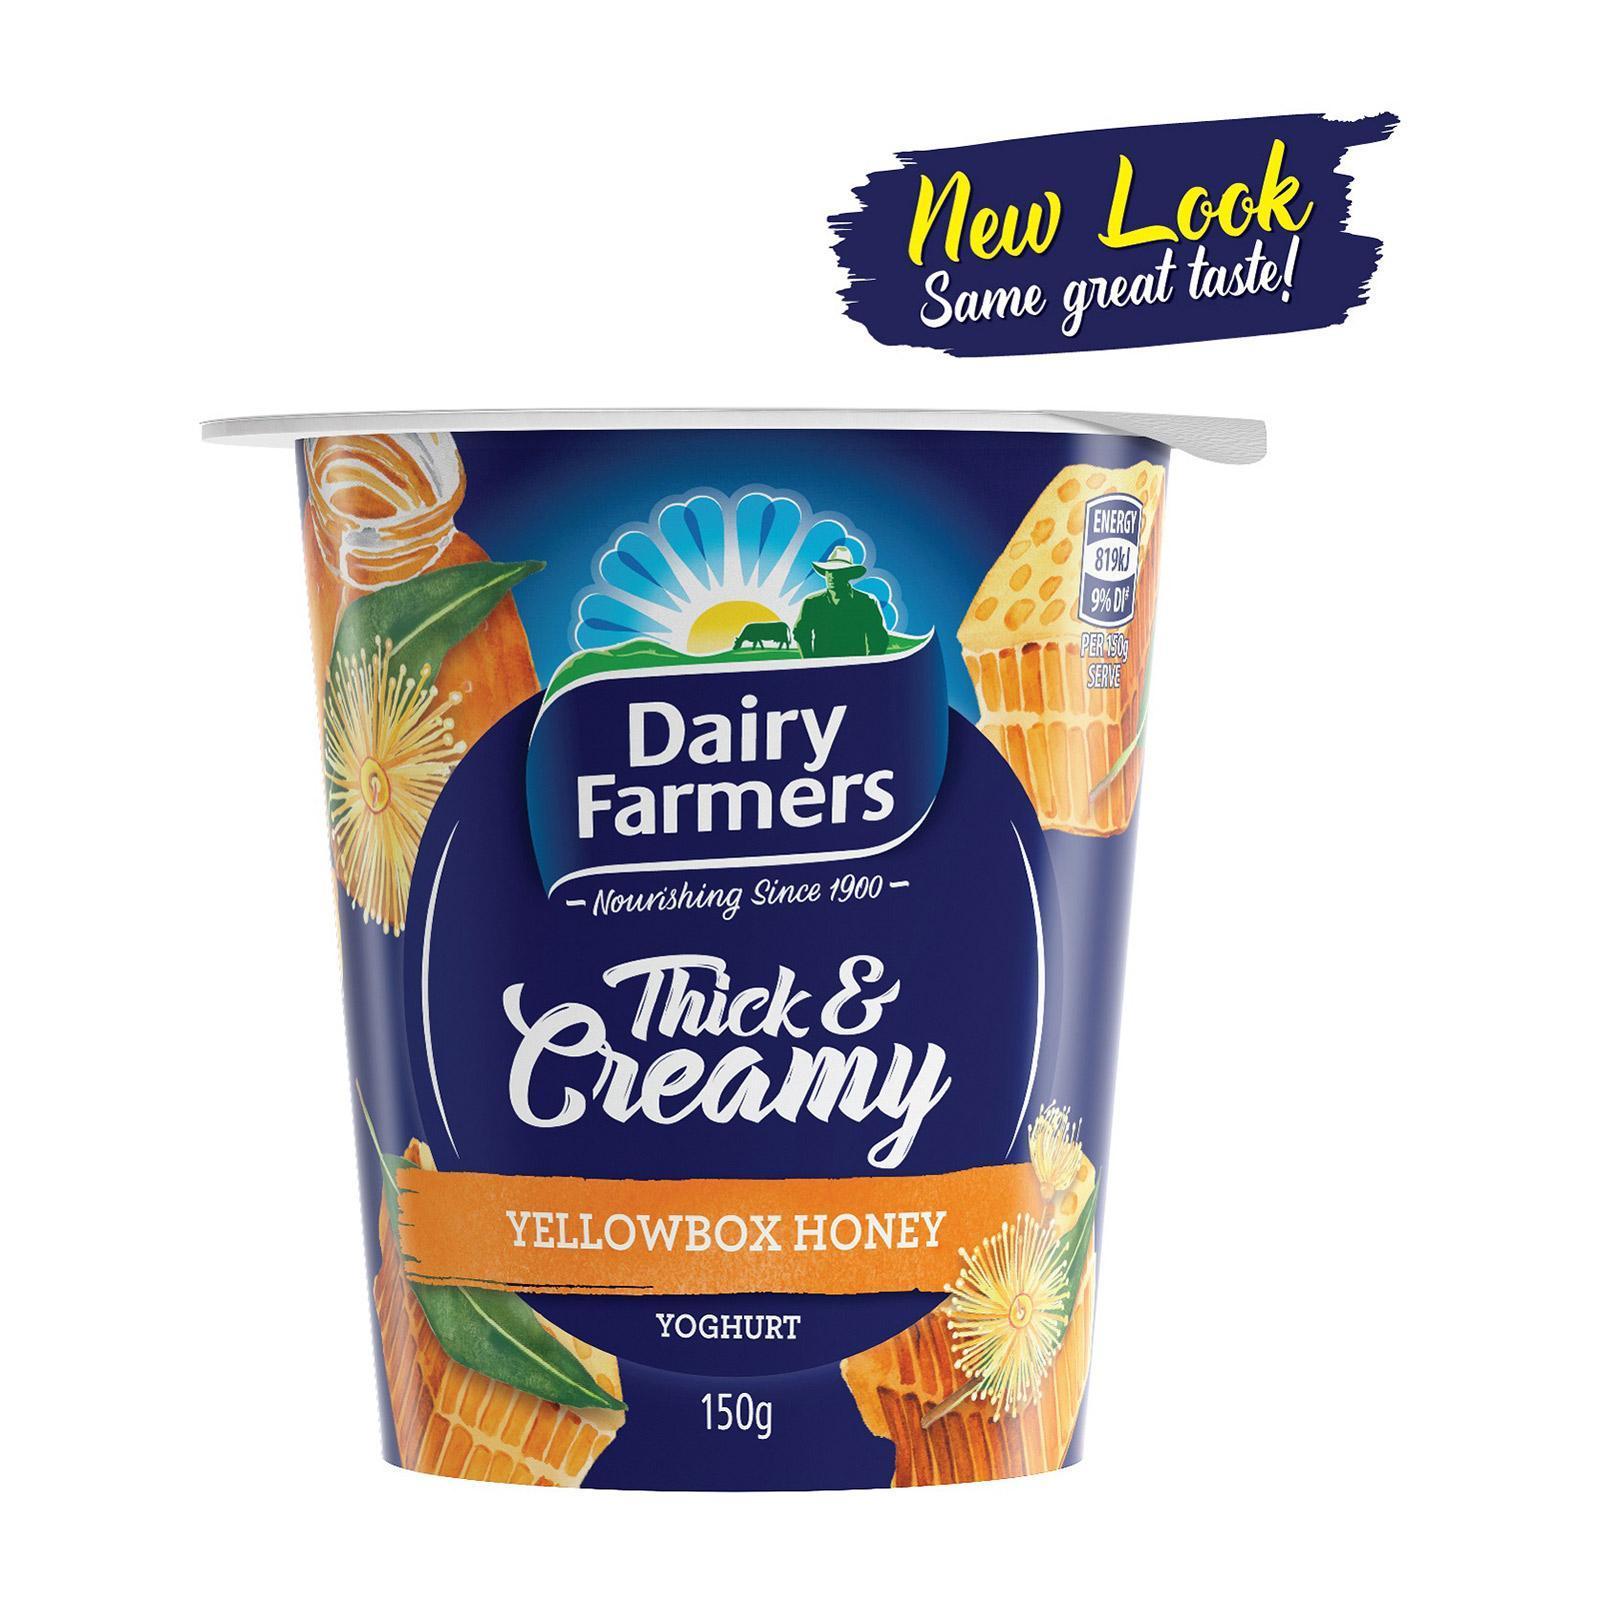 Dairy Farmers Thick And Creamy Yellow Box Honey Yoghurt